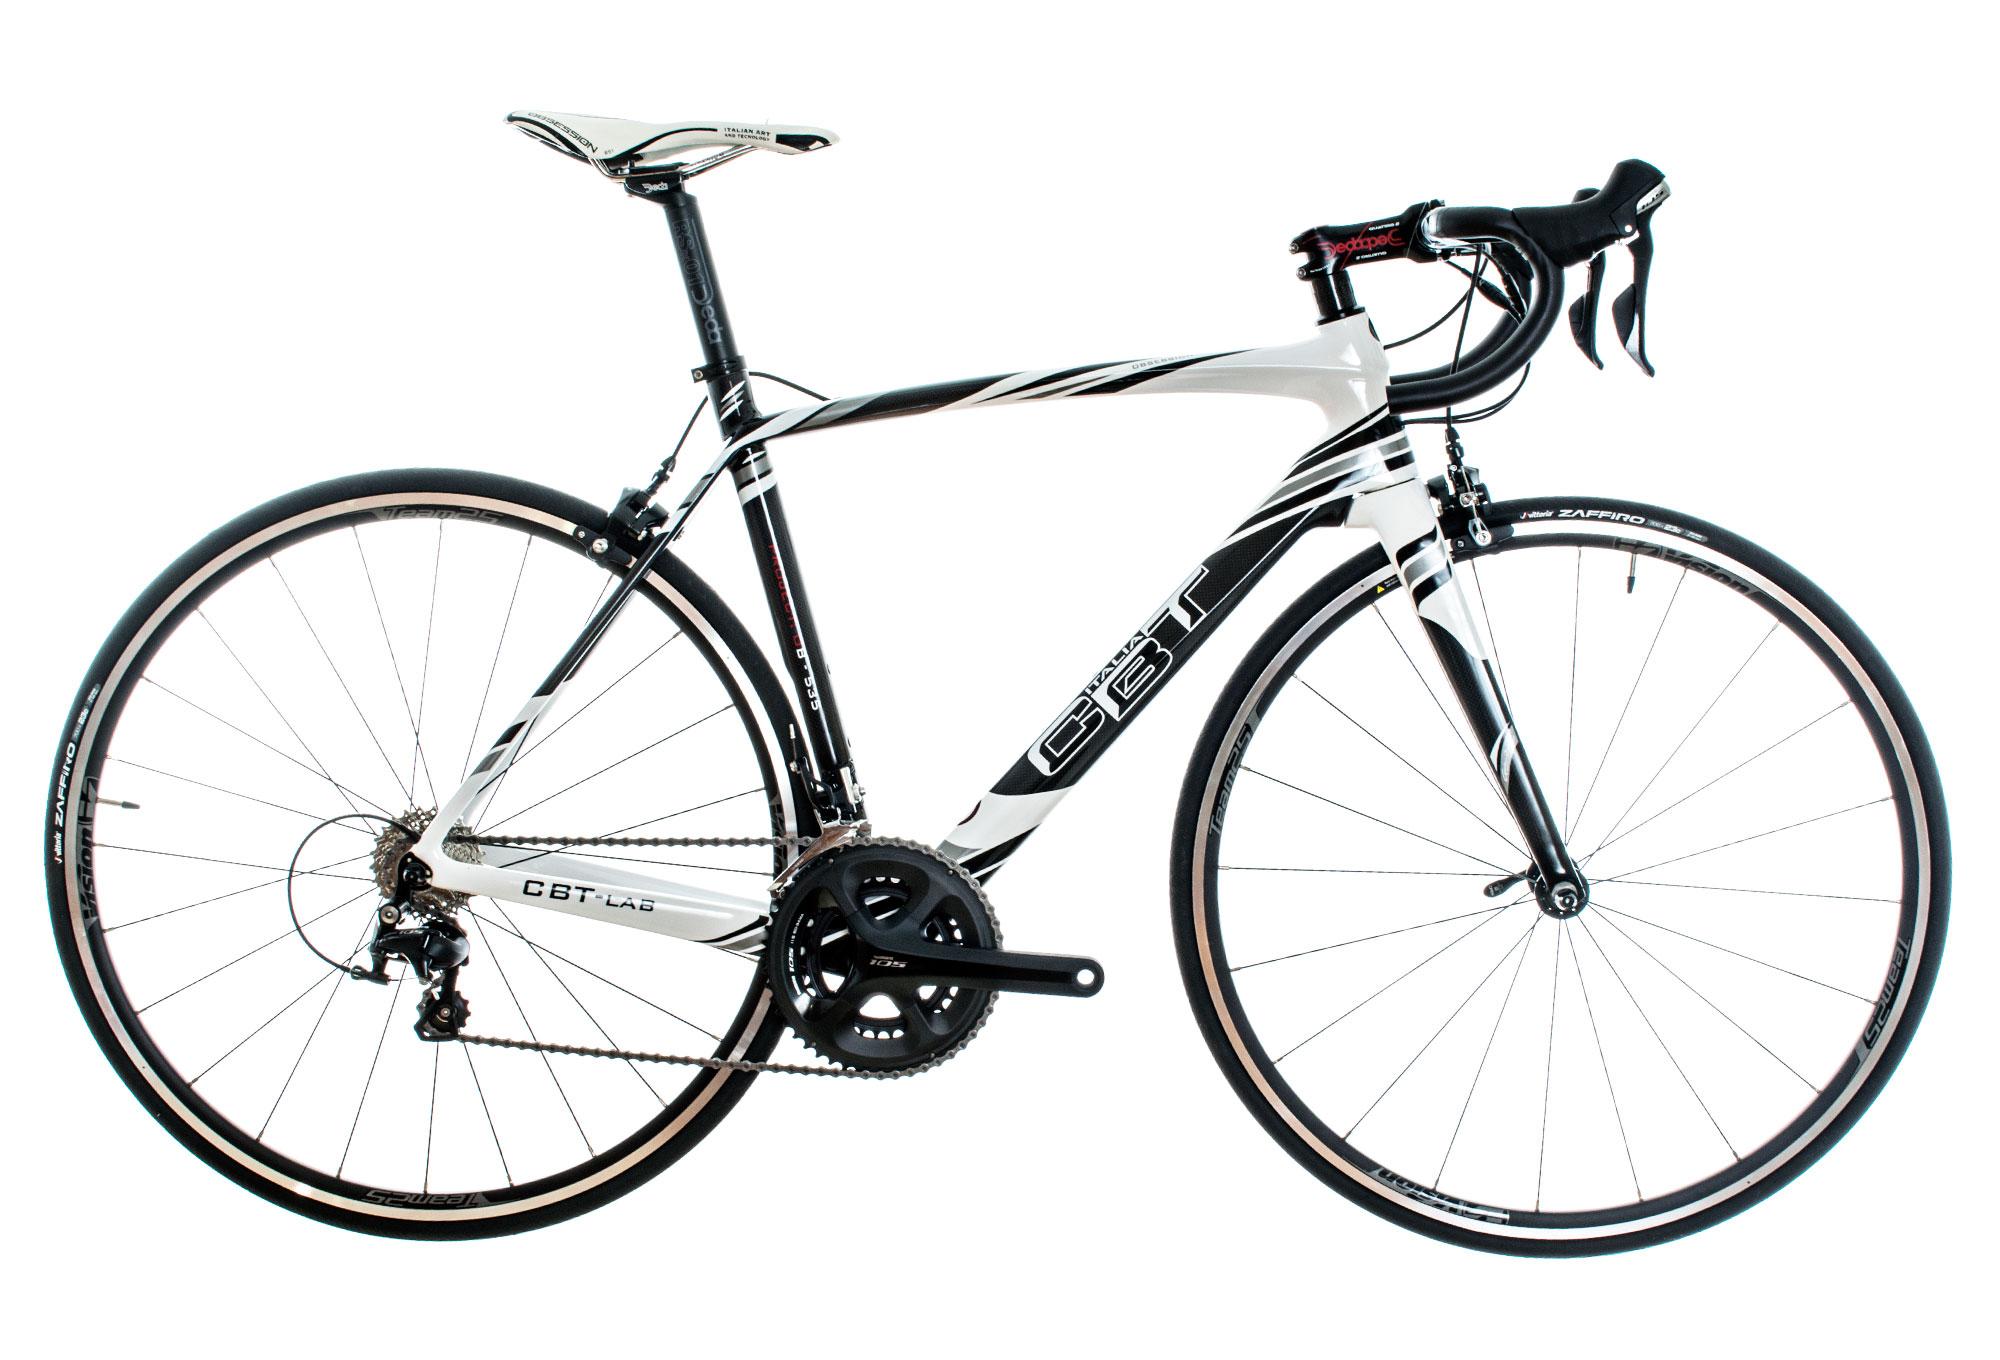 Cbt Italia Road Bike Obsession Shimano 105 11 Speed White Black